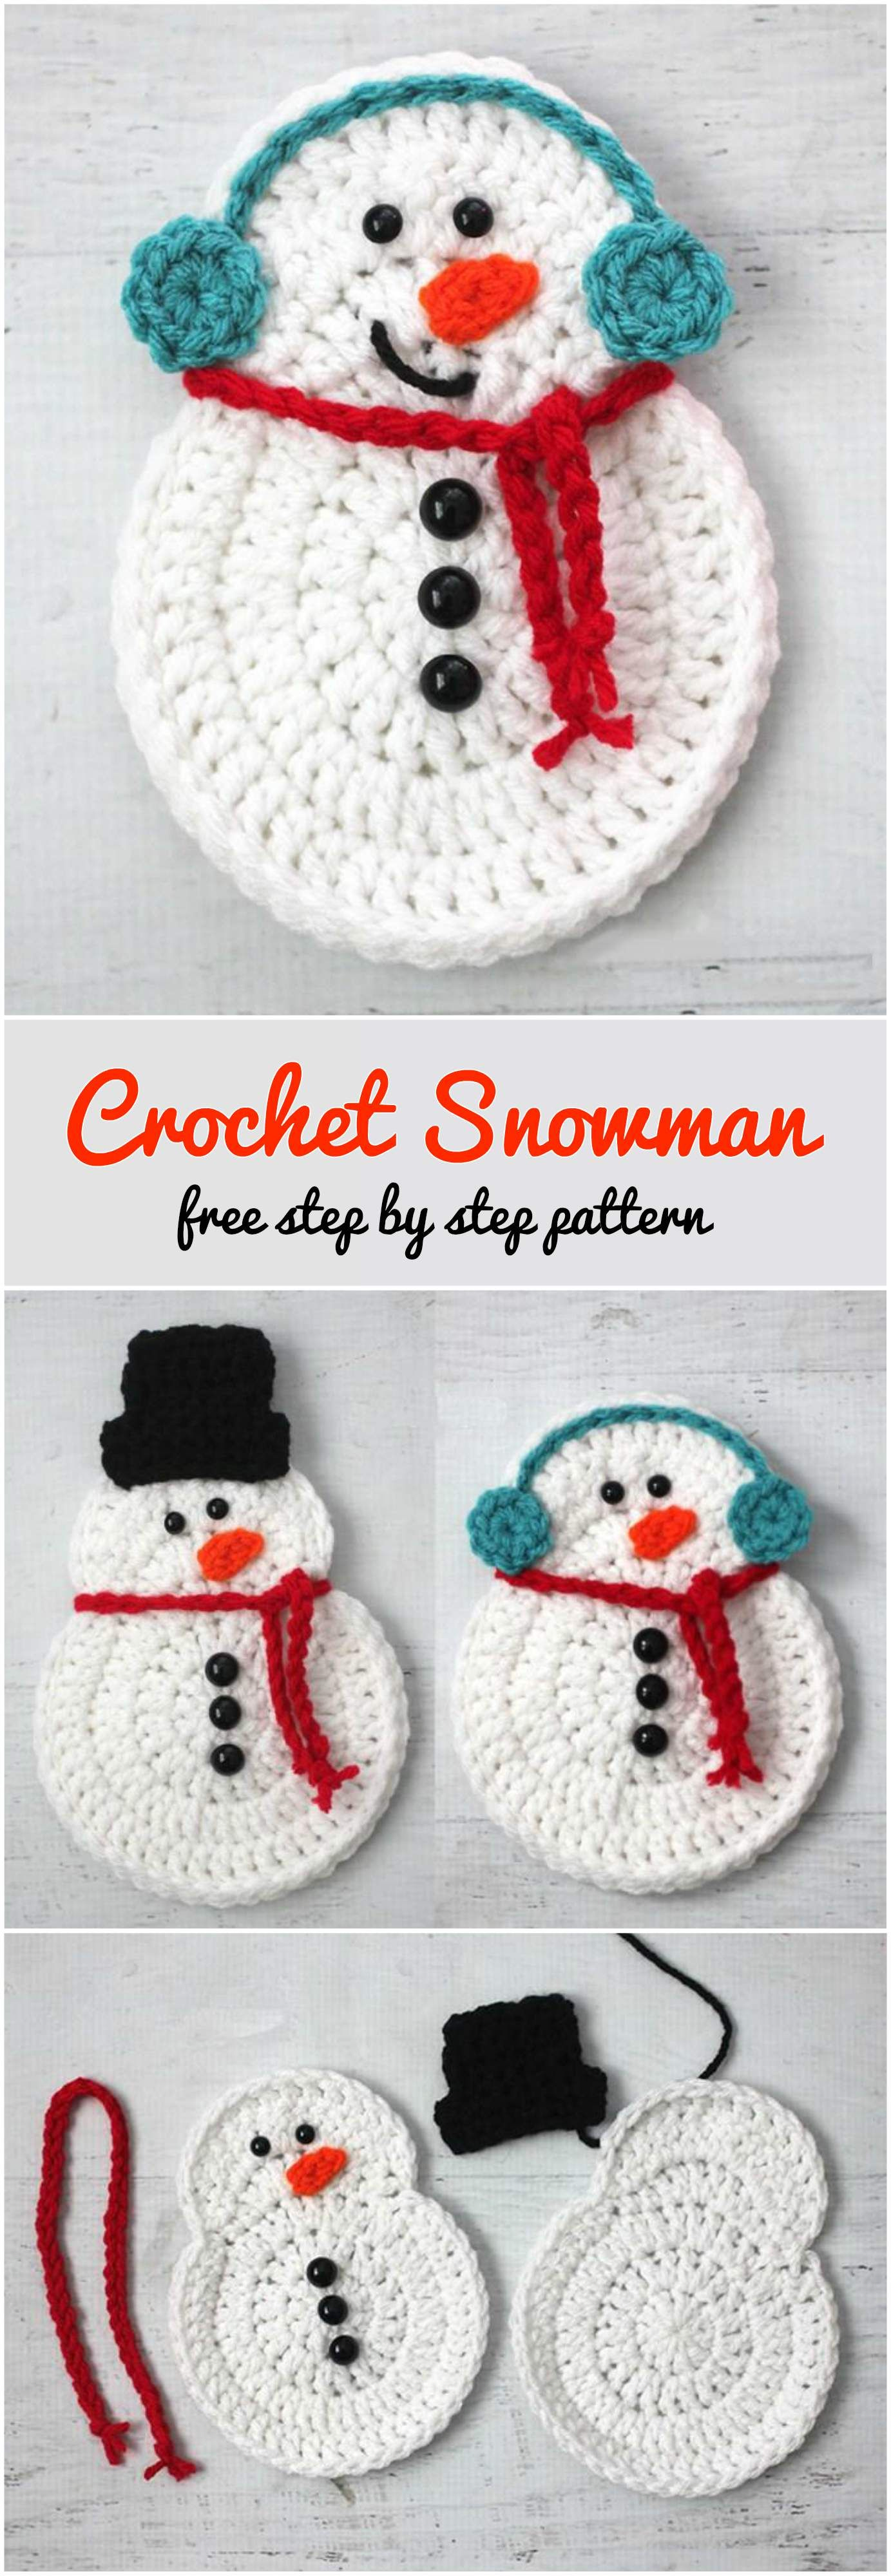 Crochet Snowman Step by Step | Ávidad y más. | Pinterest | Navidad ...